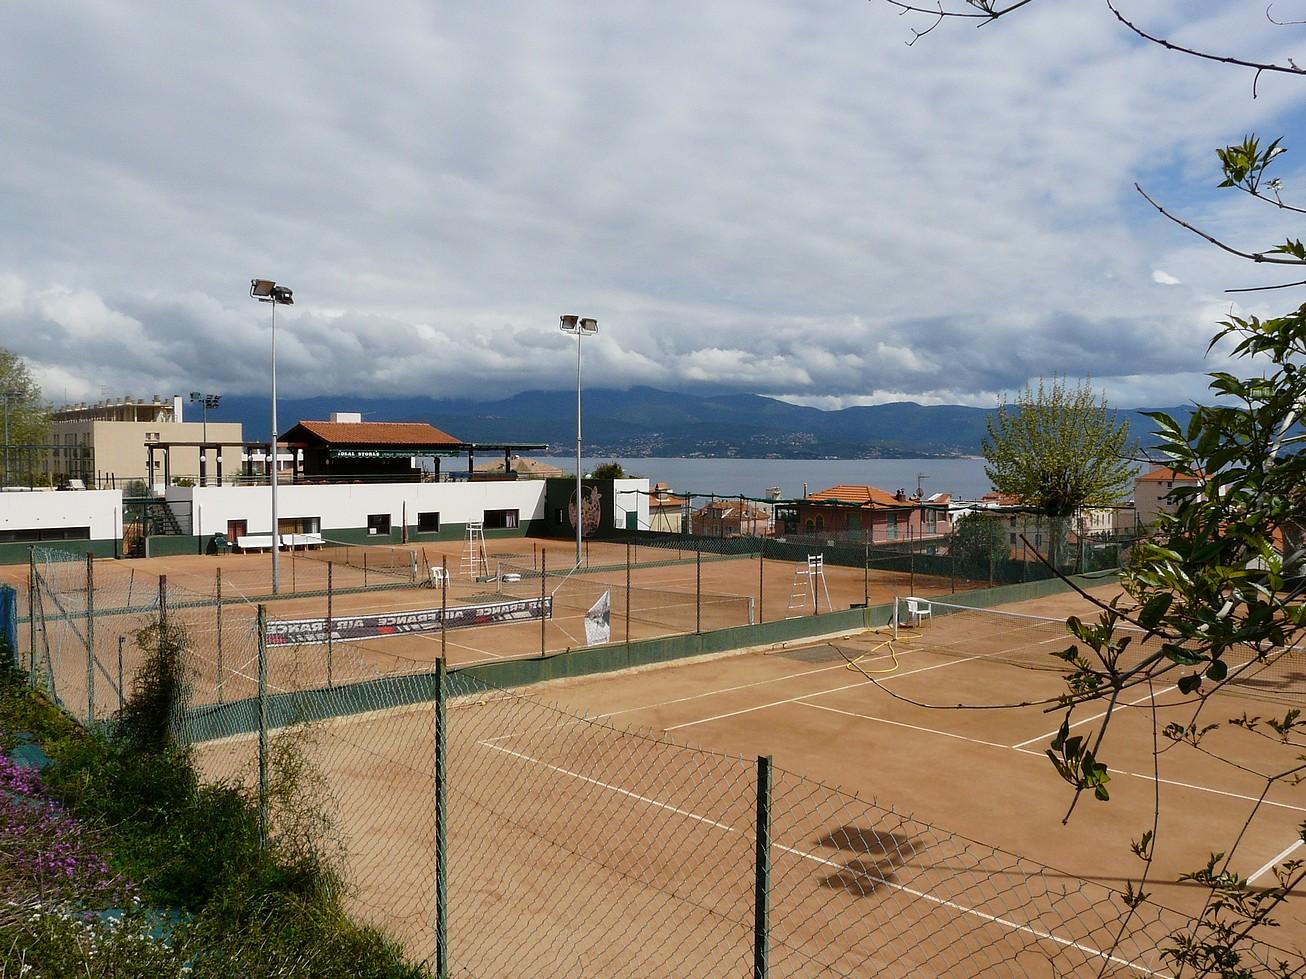 Ajaccio 3 grotte napoleon sur votre smartphone for Club de tennis interieur saguenay